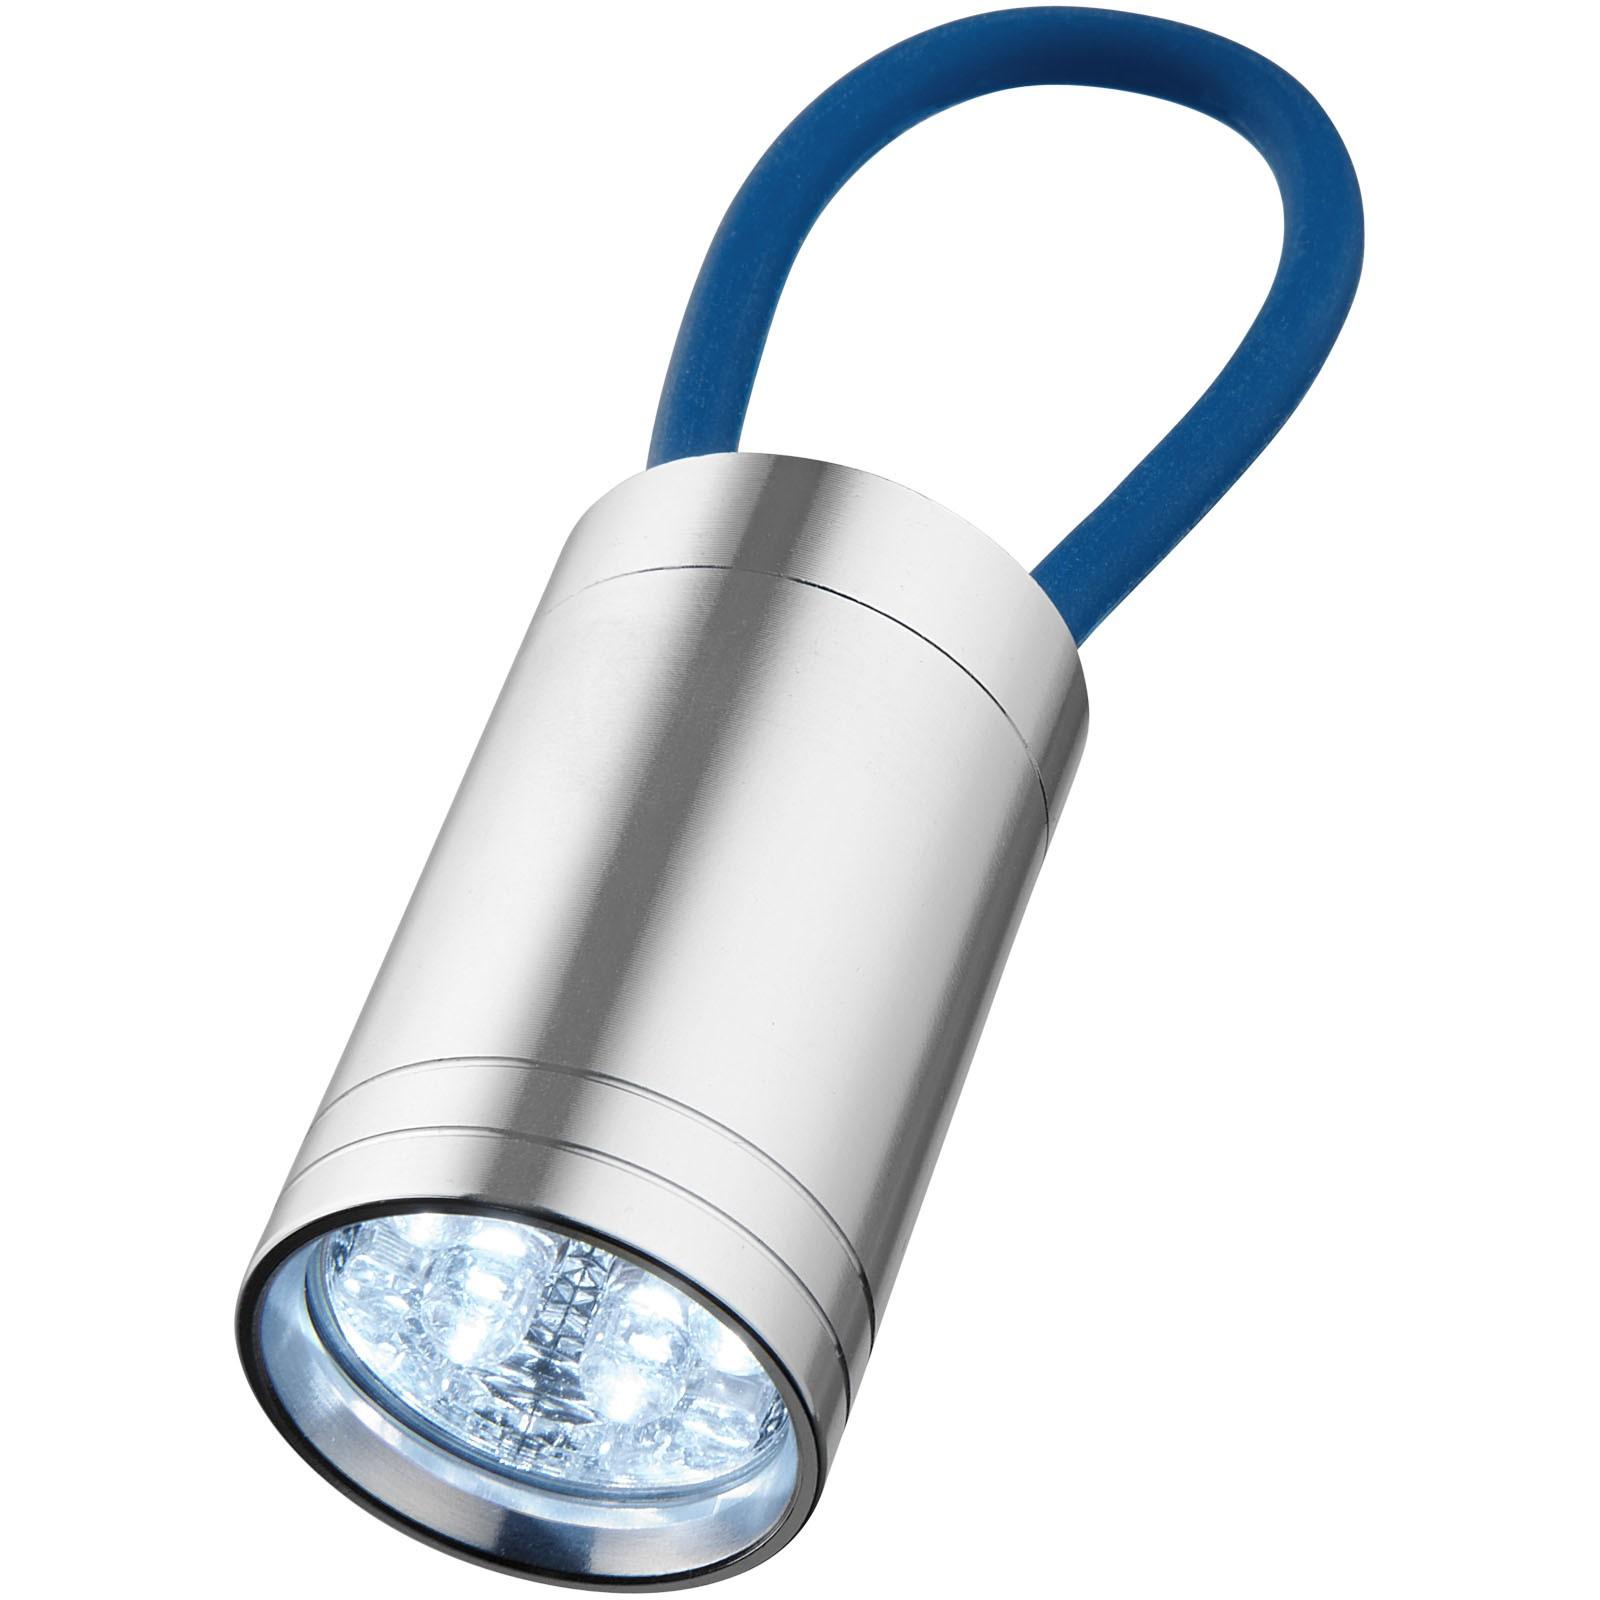 Vela 6-LED torch with glow strap - Royal blue